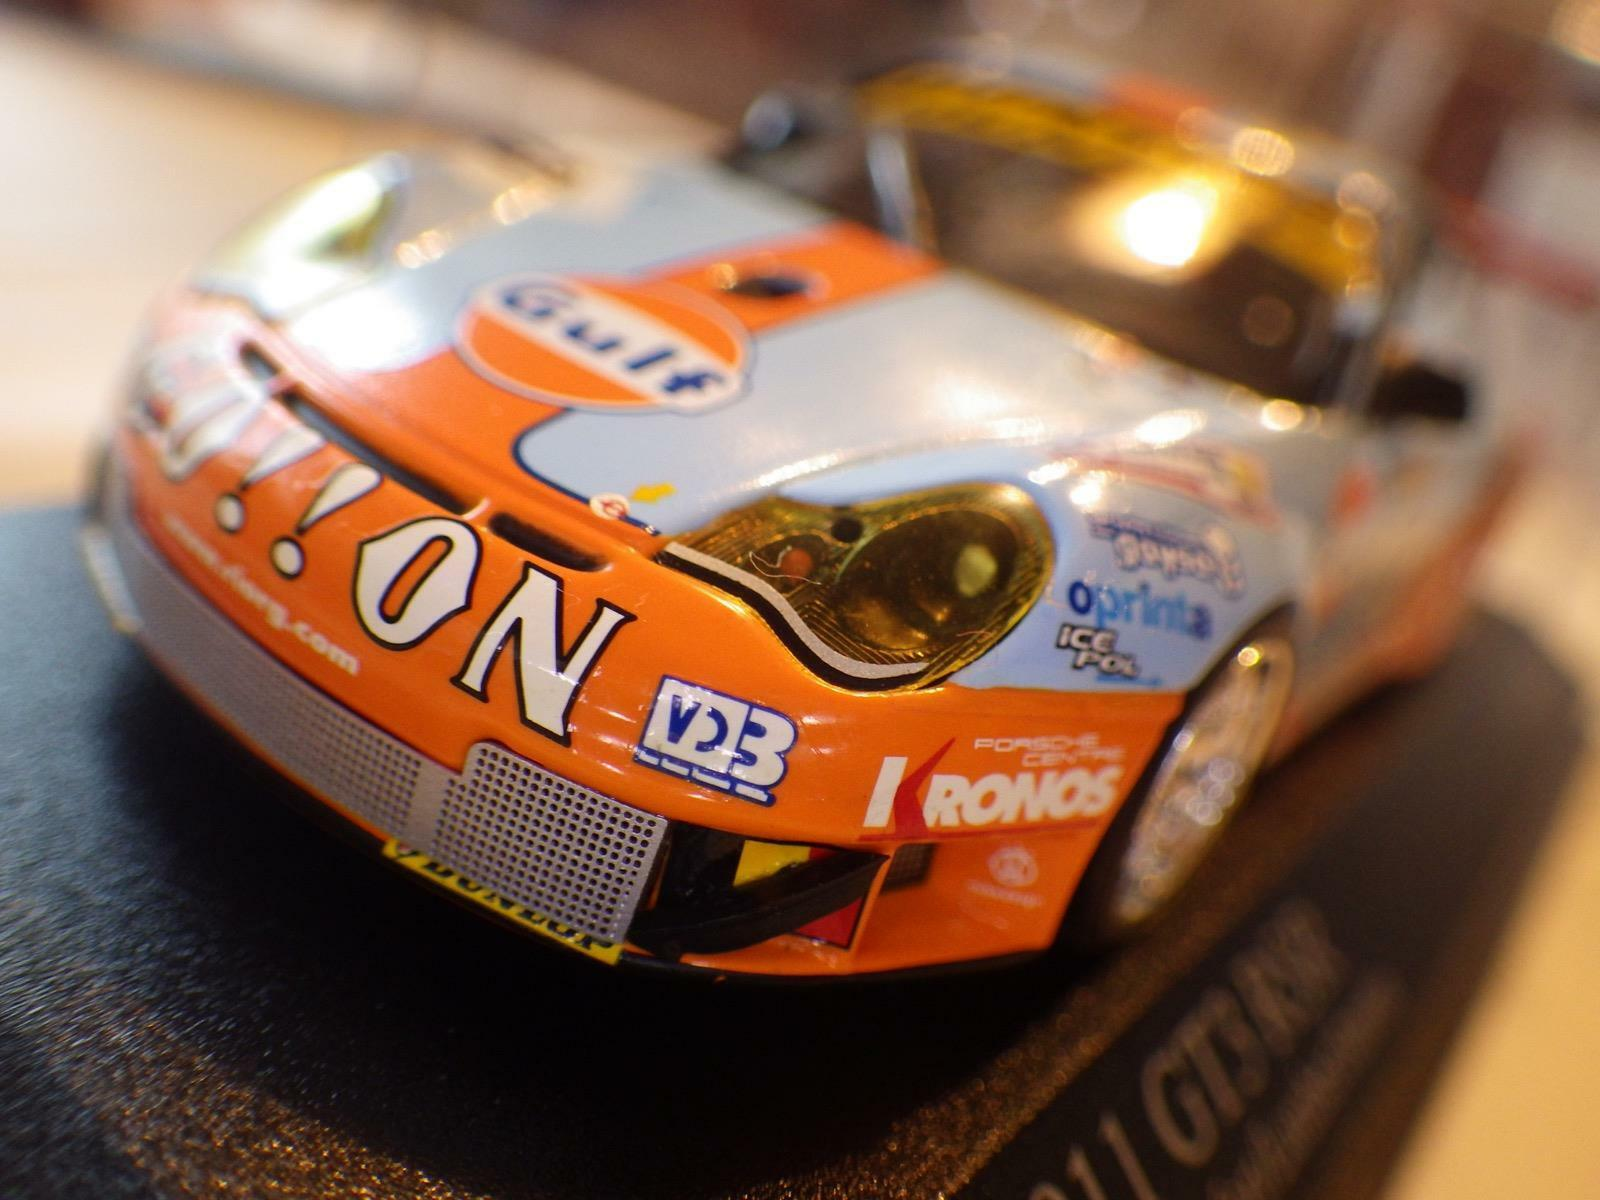 Paul's Model Art Light blu/arancia Porsche 911 GT3 RSR Le Mans 2006 Diecast 1:43